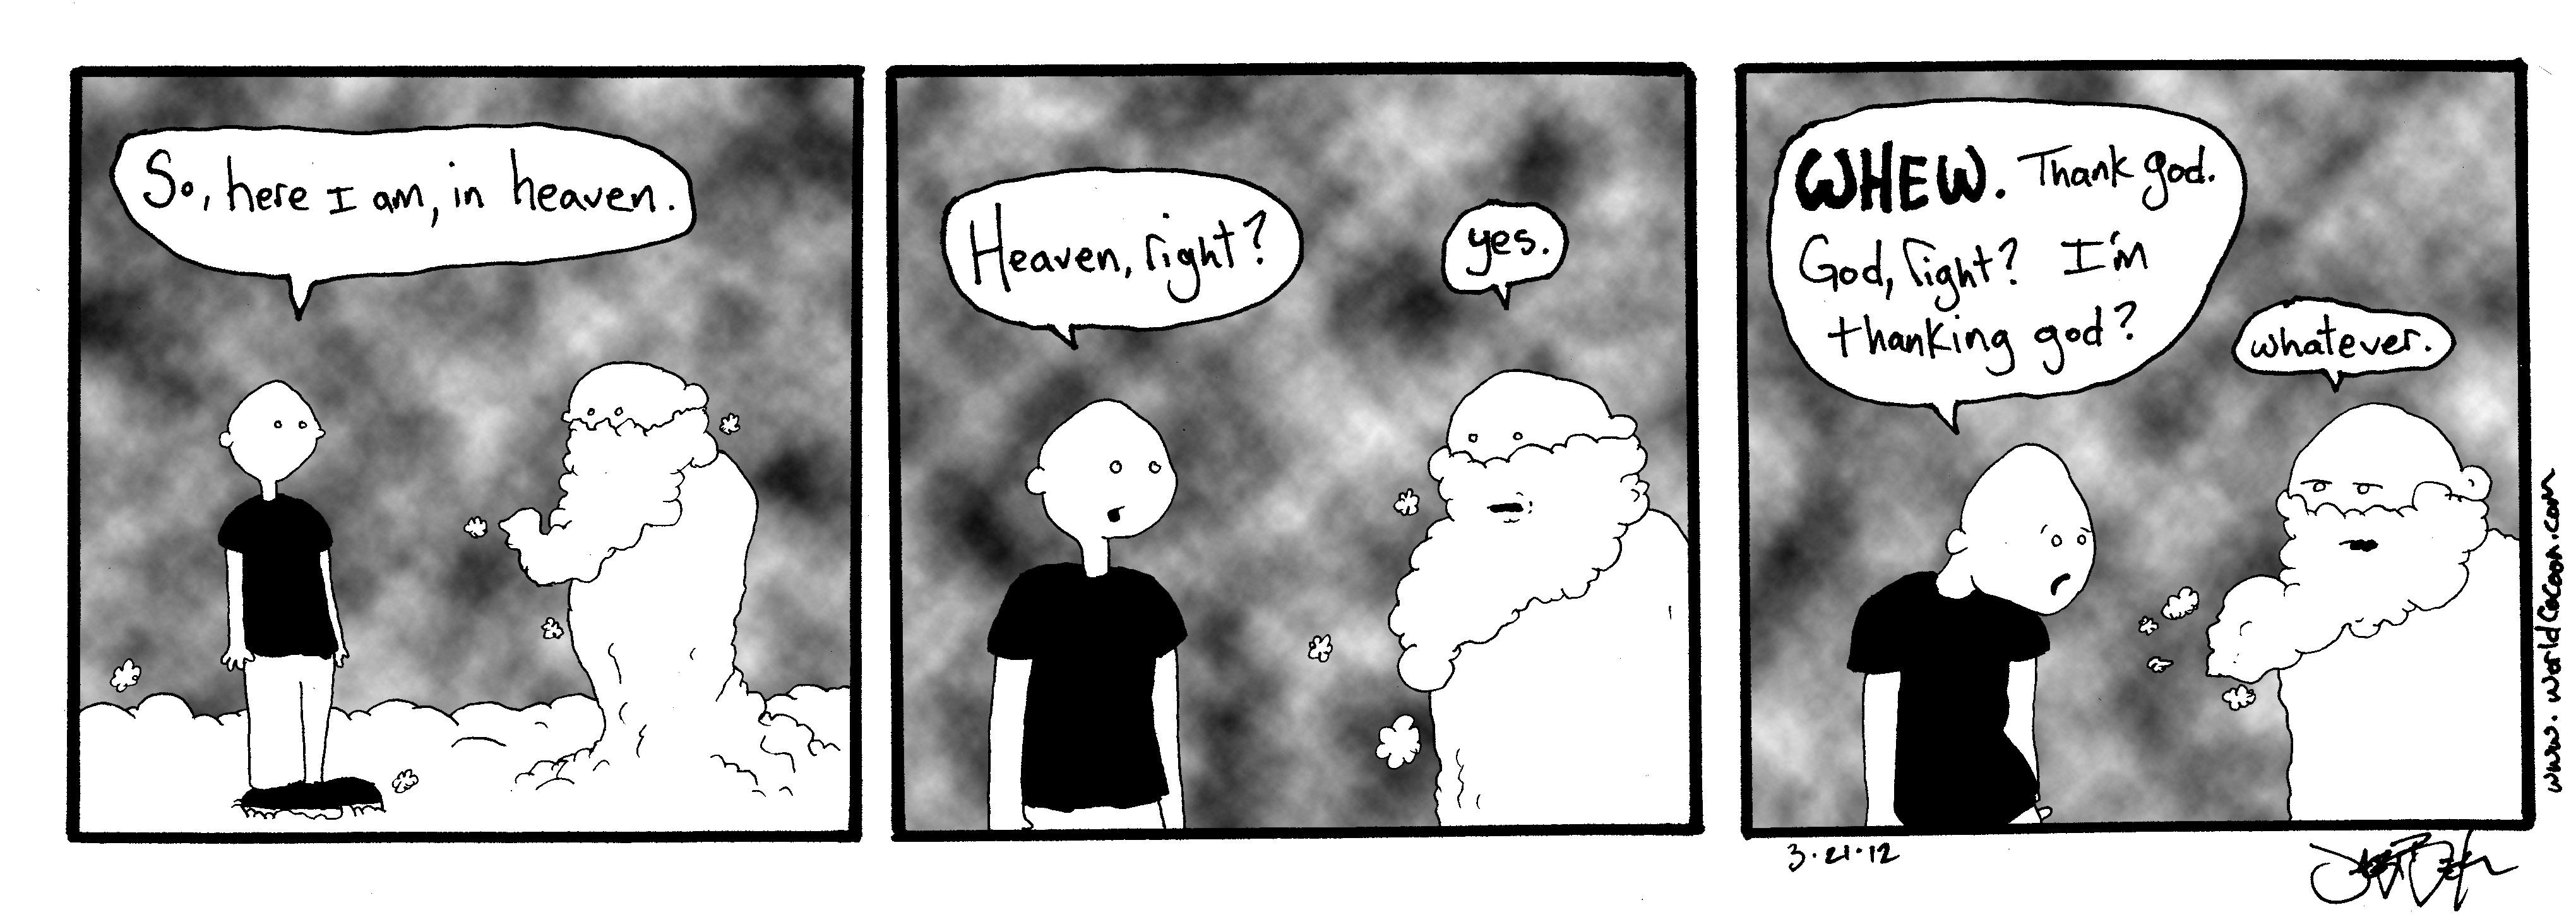 03/21/2012